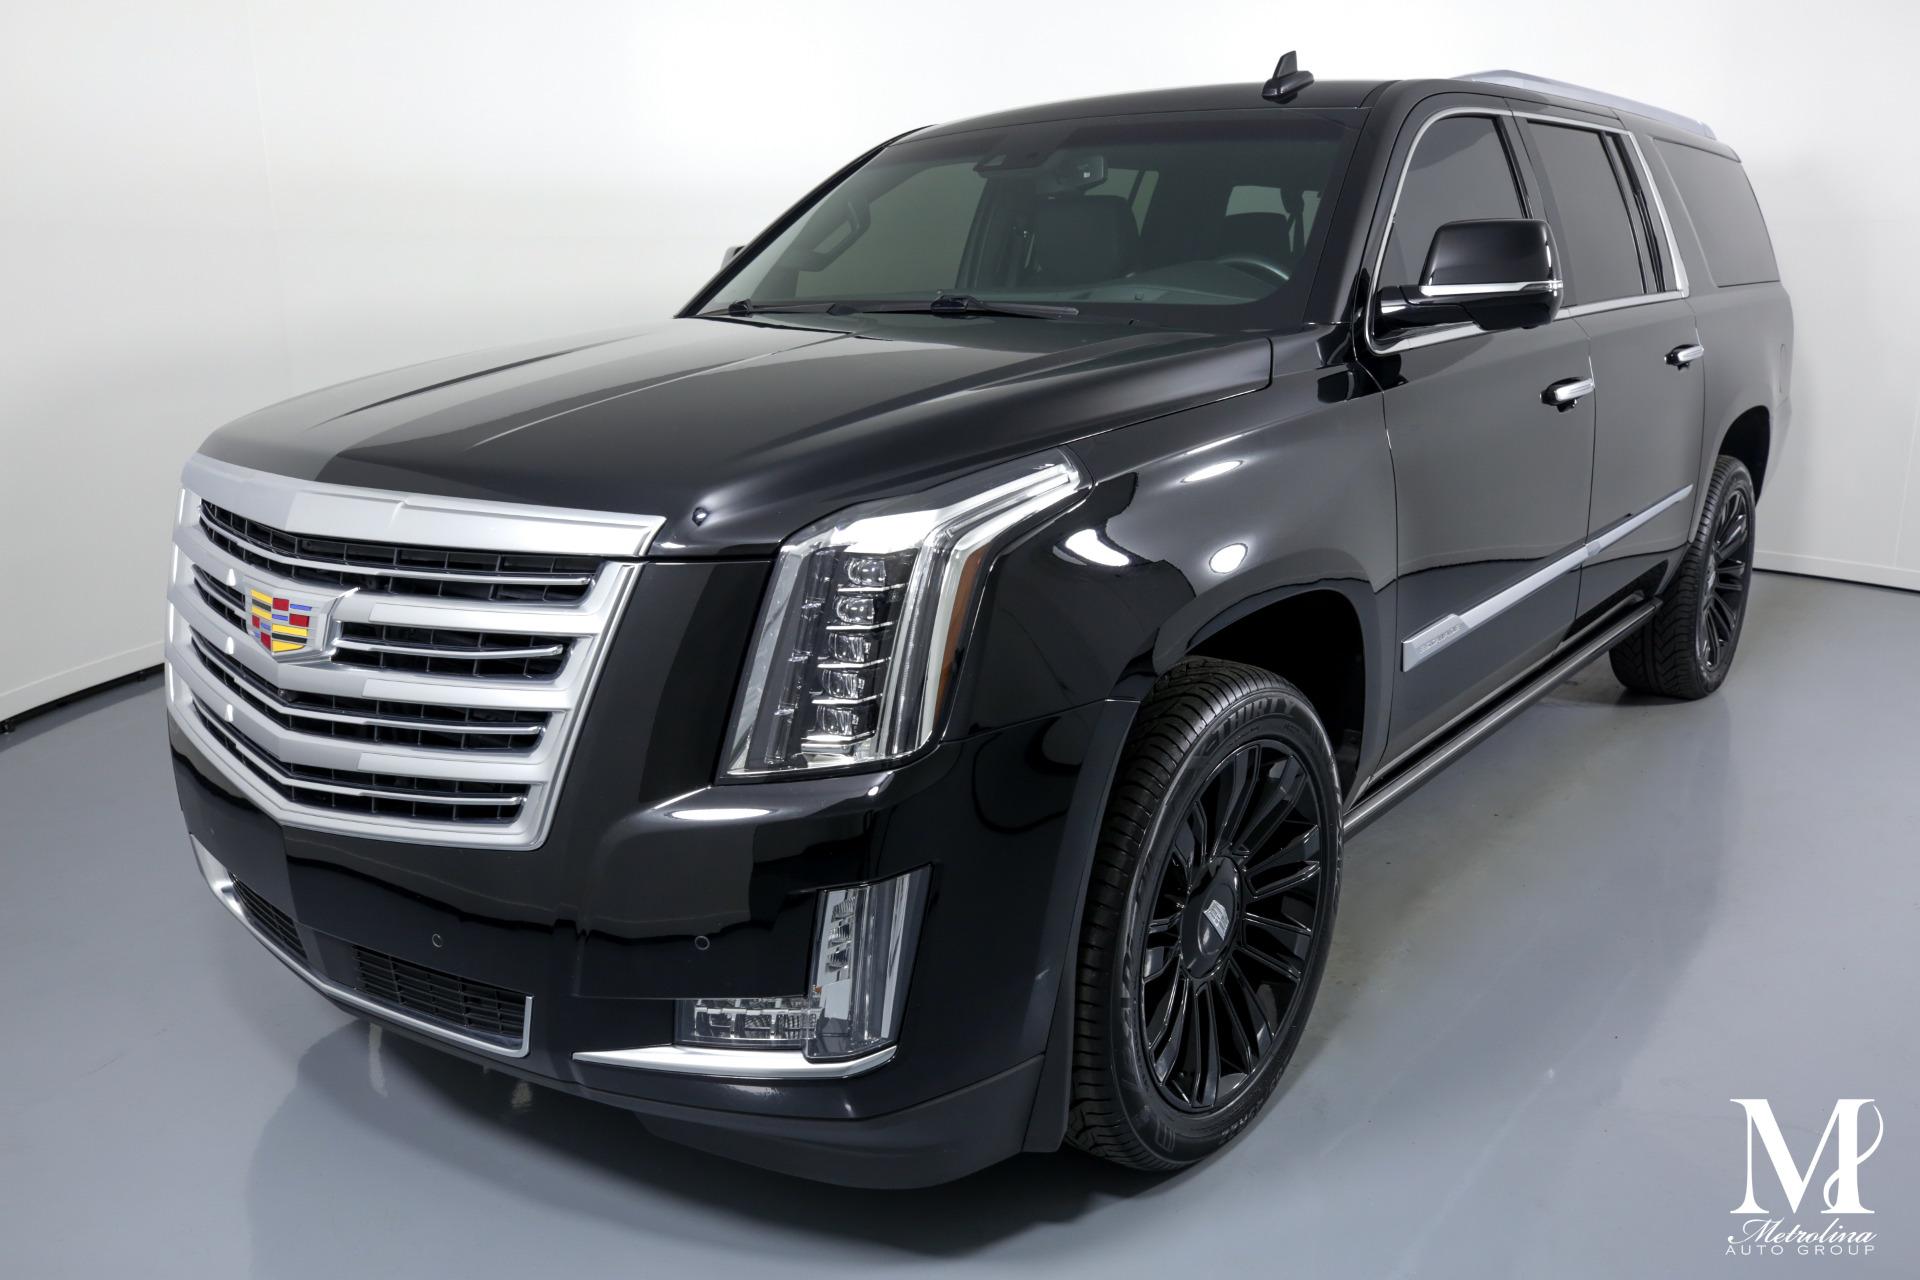 Used 2016 Cadillac Escalade ESV Platinum for sale $54,996 at Metrolina Auto Group in Charlotte NC 28217 - 4